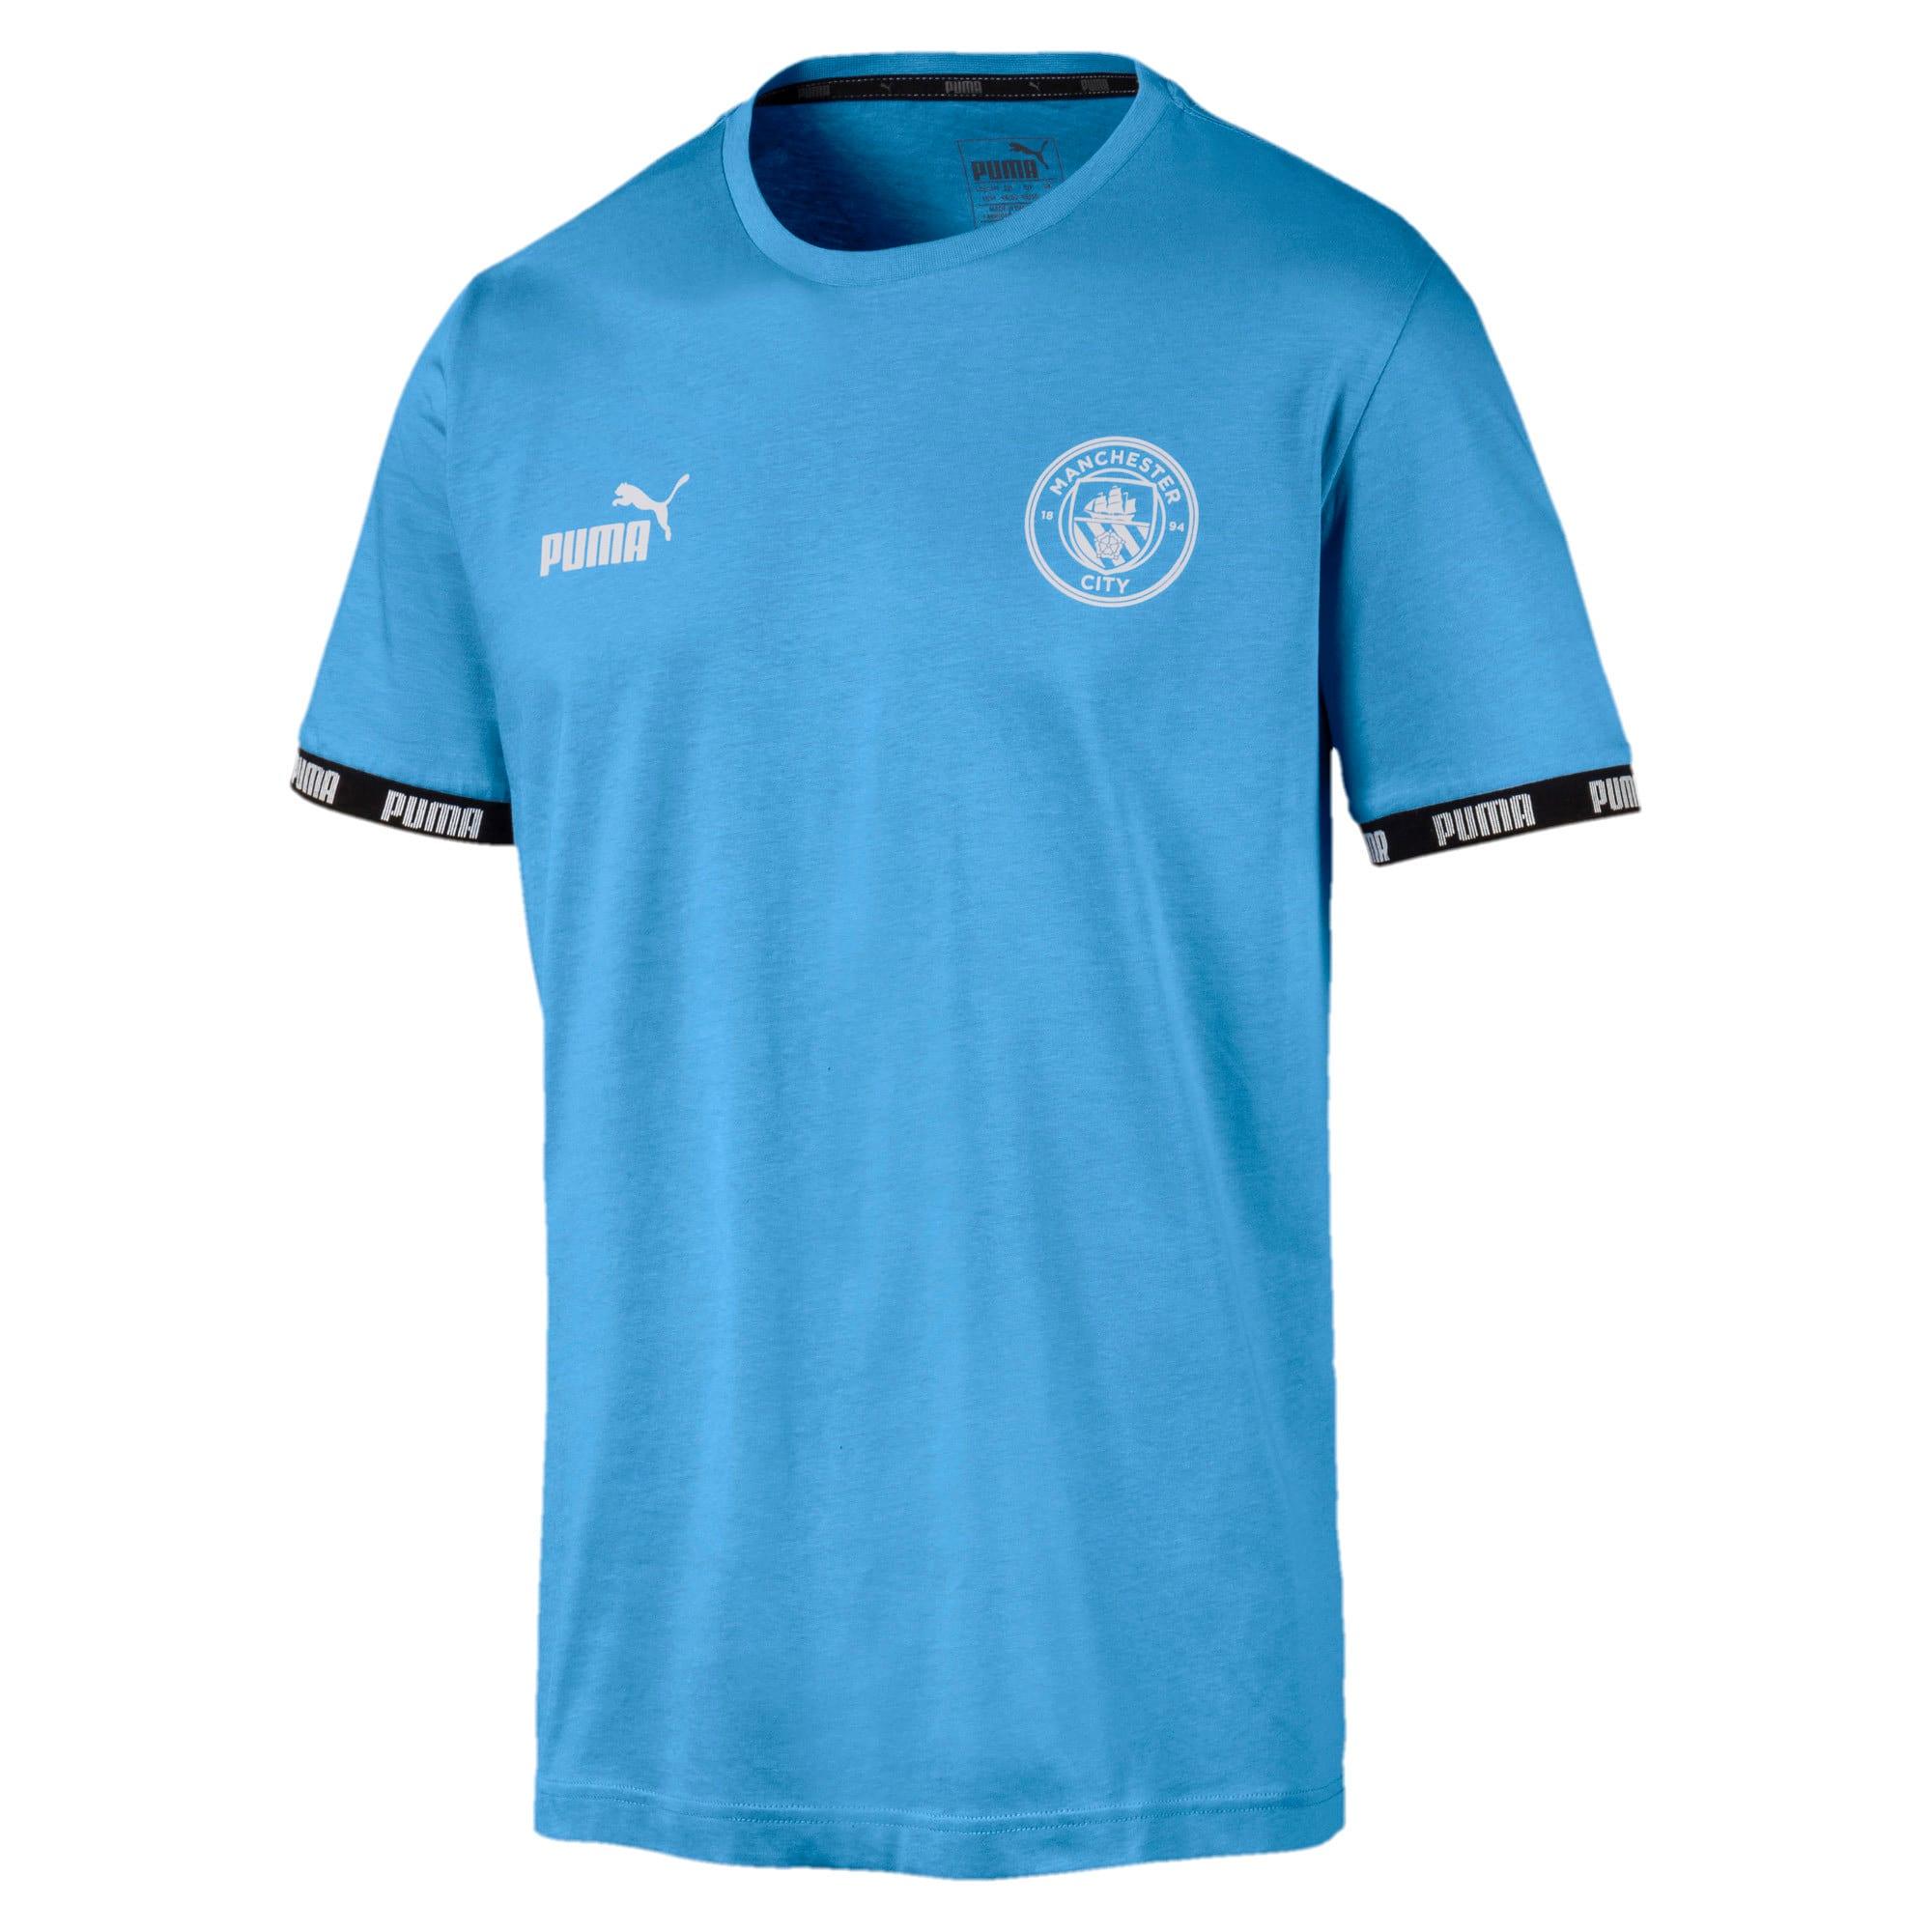 Thumbnail 4 of Manchester City FC FtblCulture Men's Tee, Team Light Blue, medium